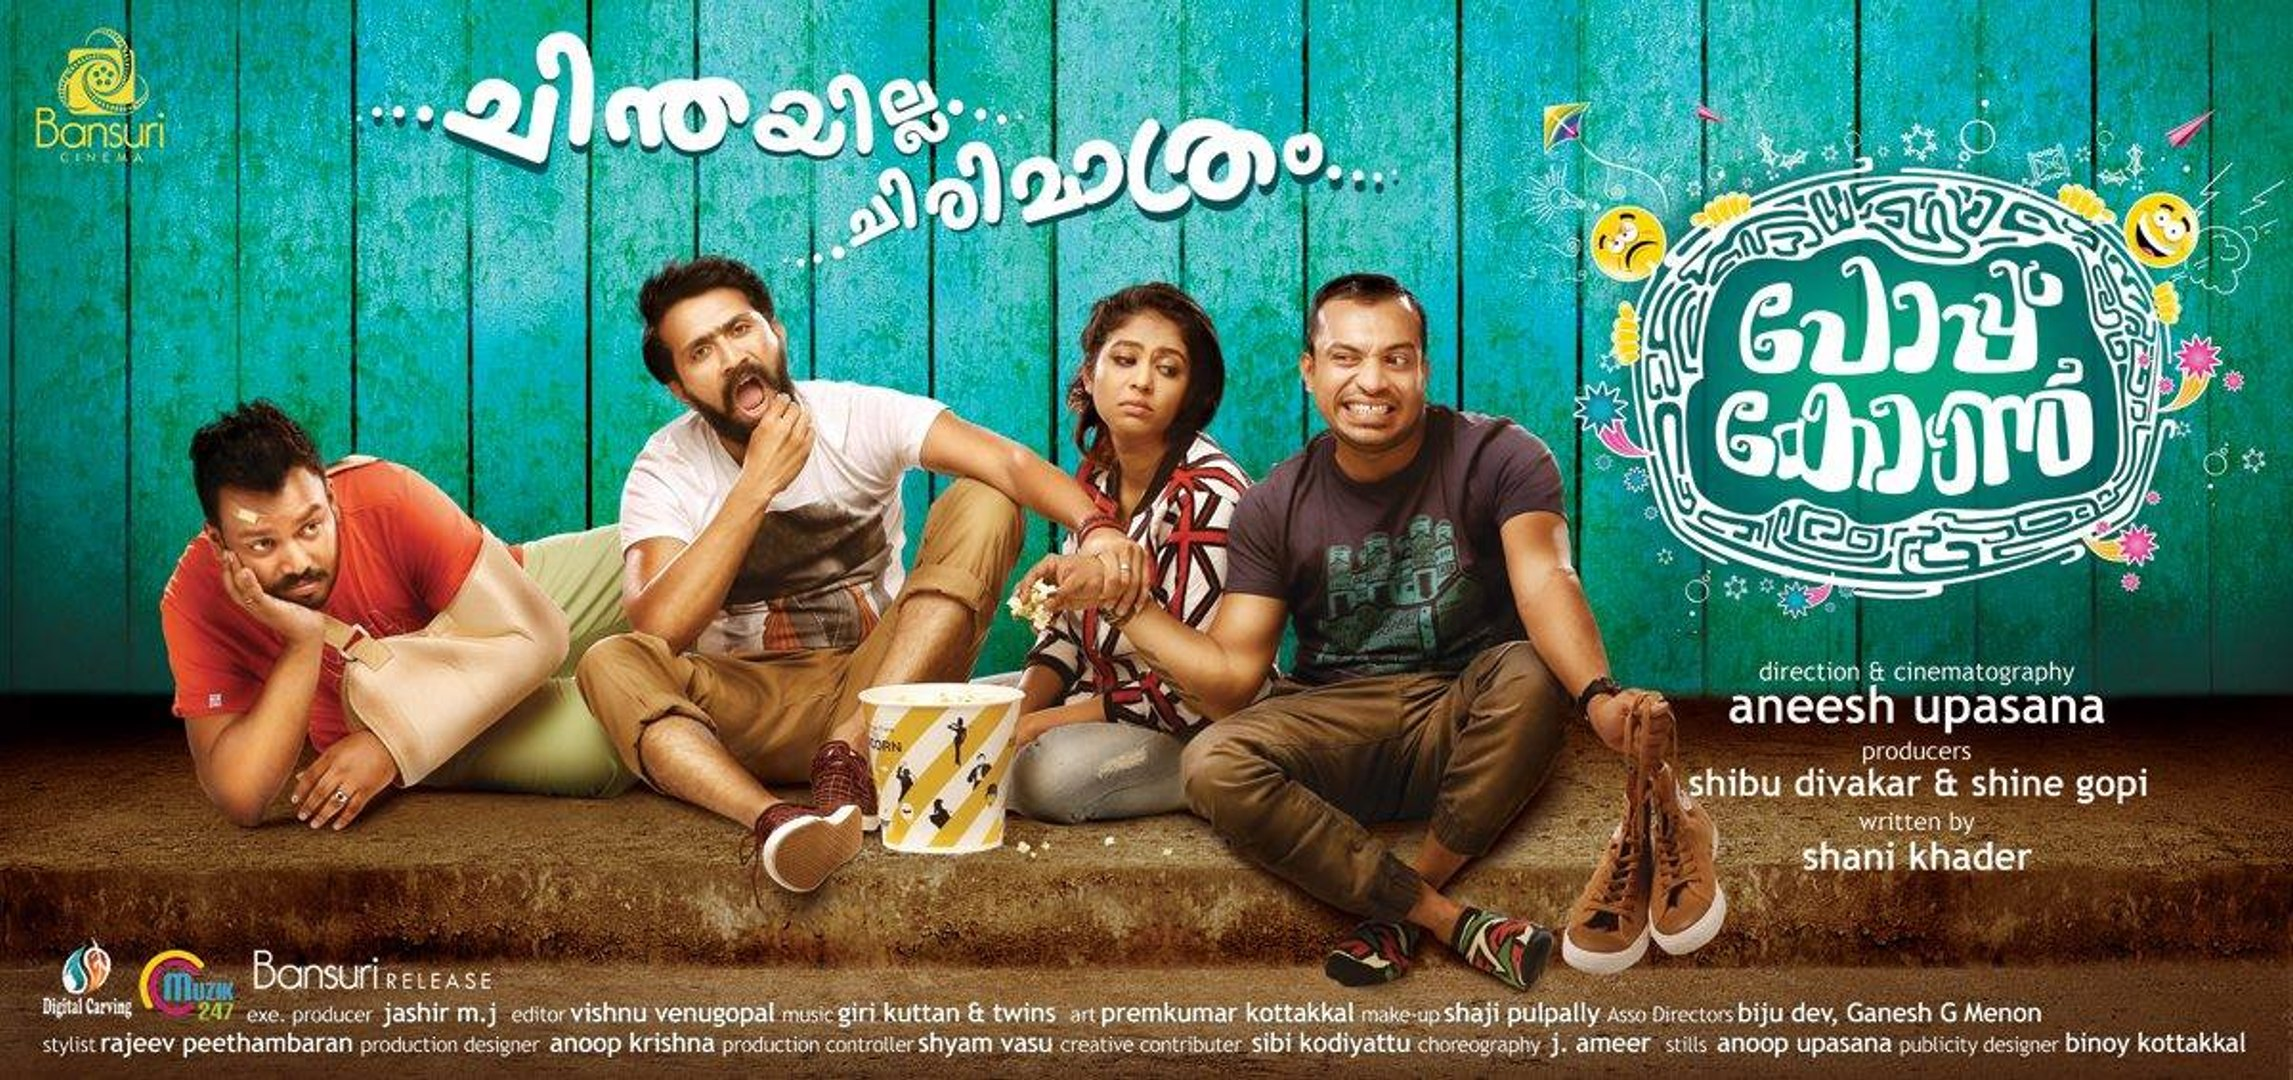 Popcorn (2016) Malayalam HDRip movie part 1